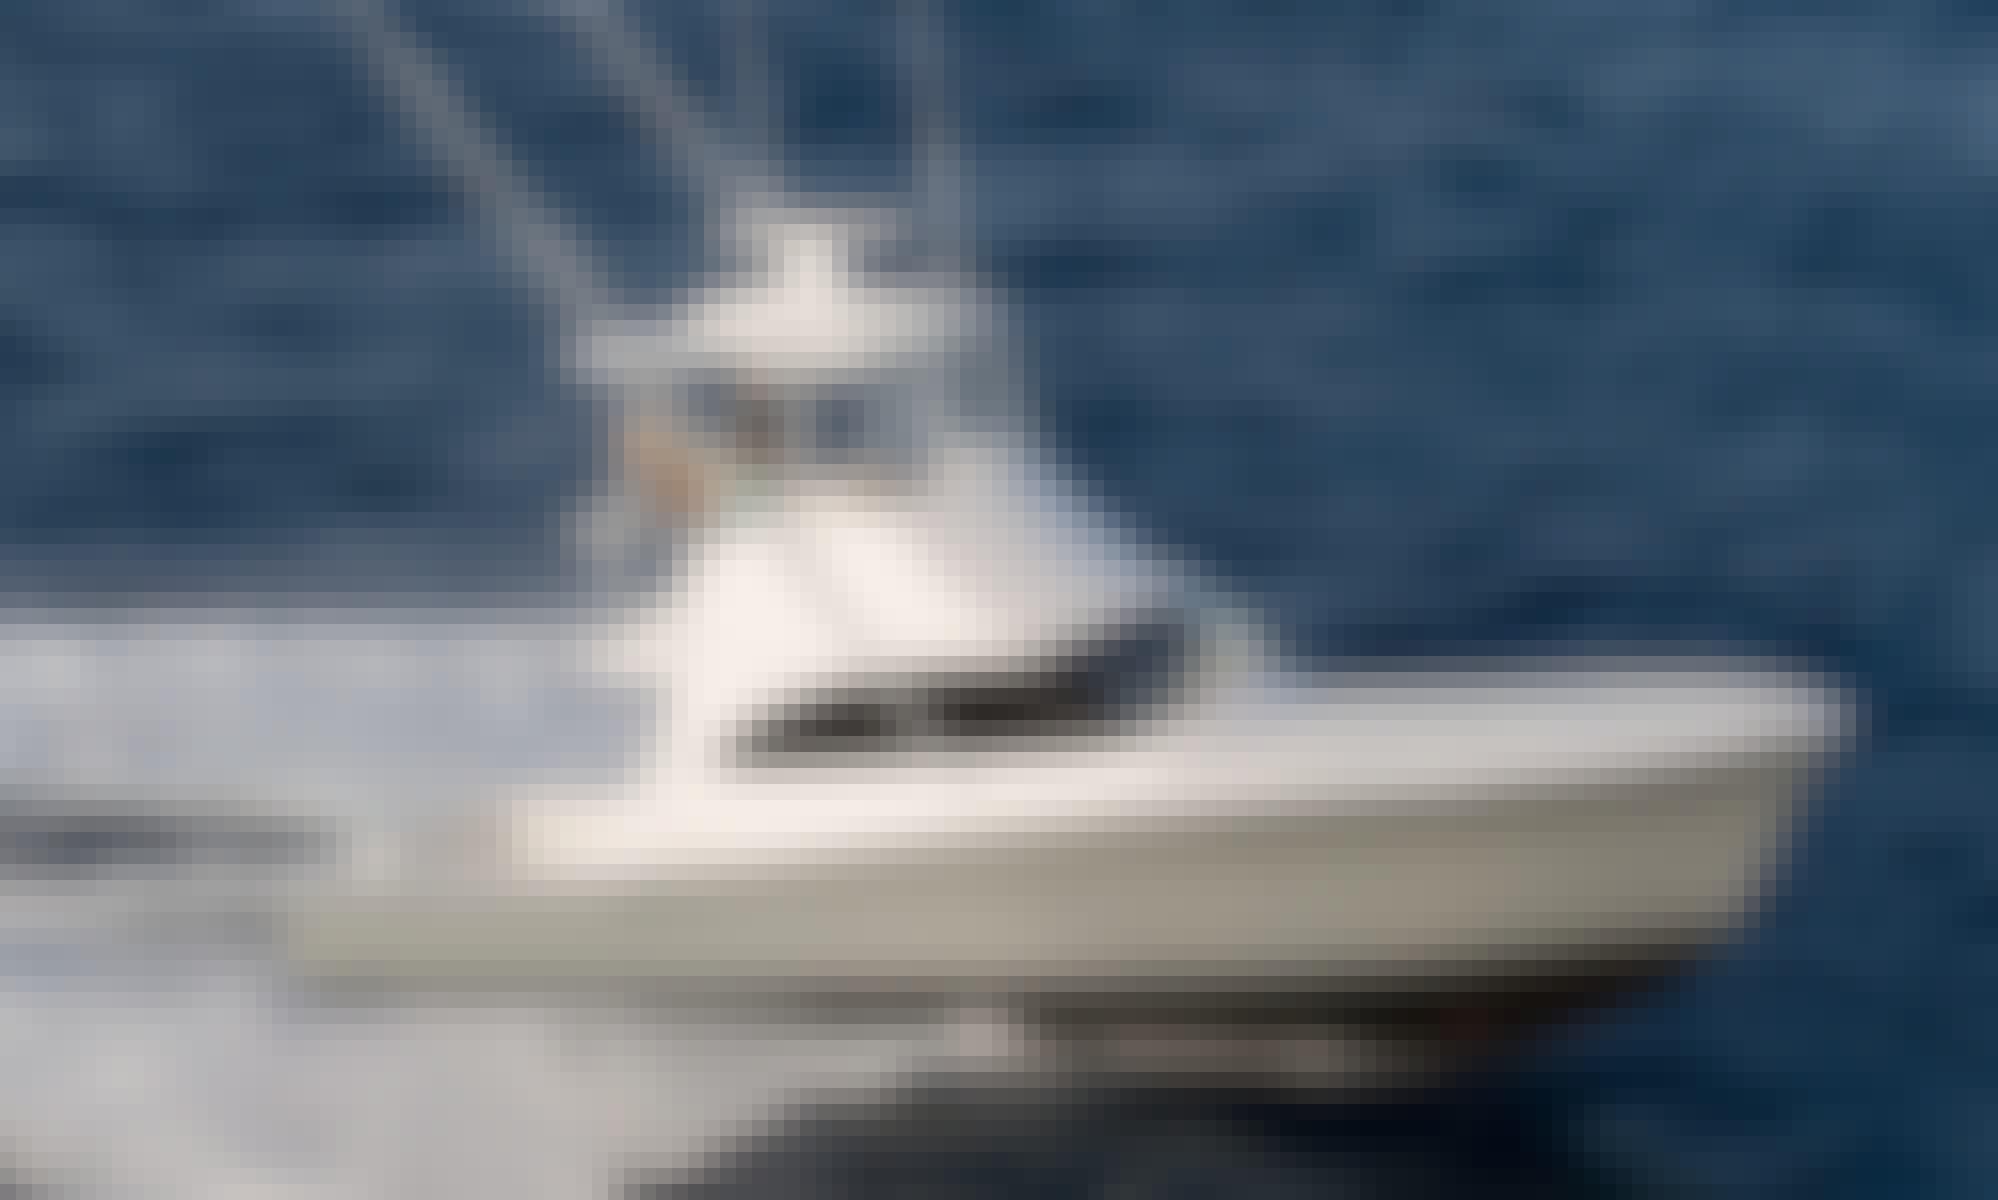 Viking Convertible Luxury Yacht Cruise, Coastal & Catalina Island Charters, in Dana Point, CA